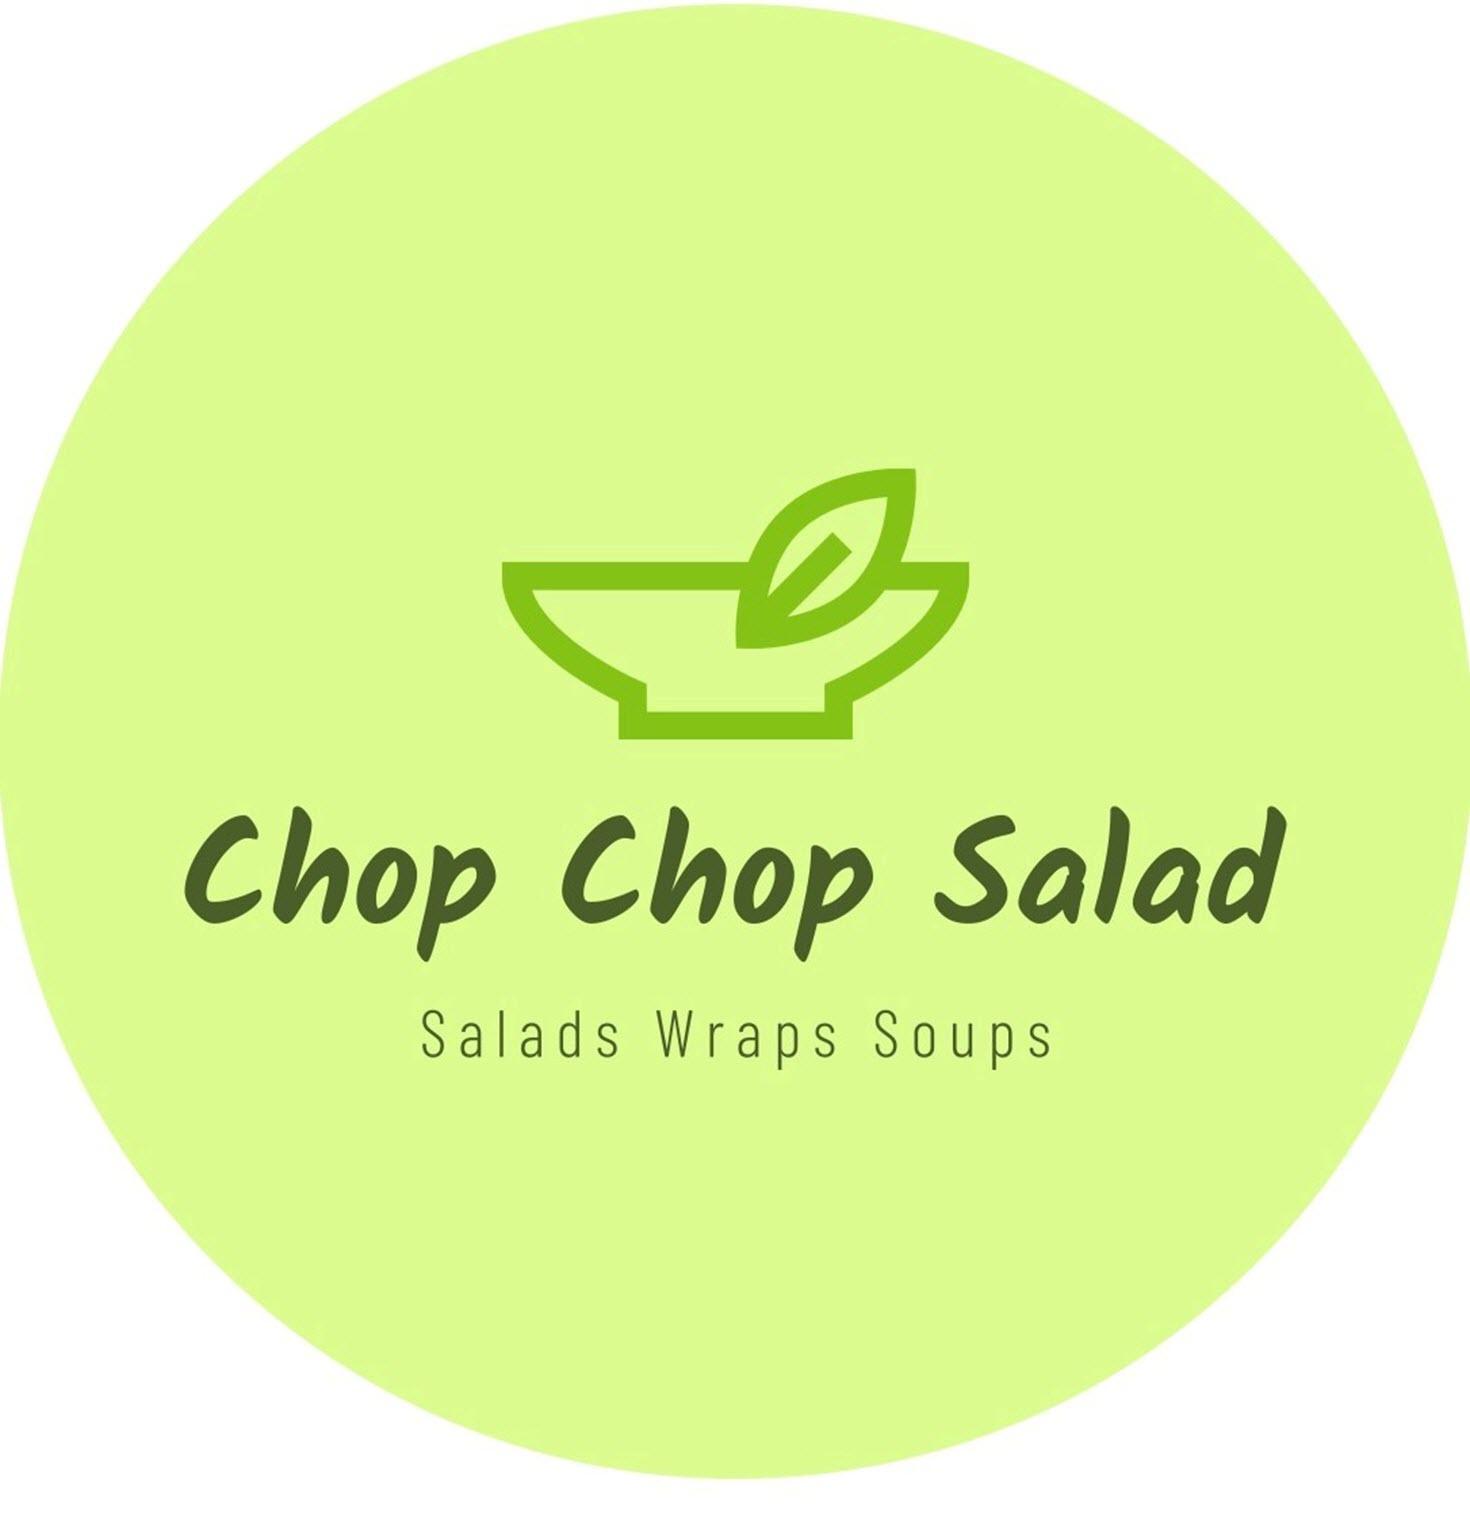 Chop Chop Salad Logo